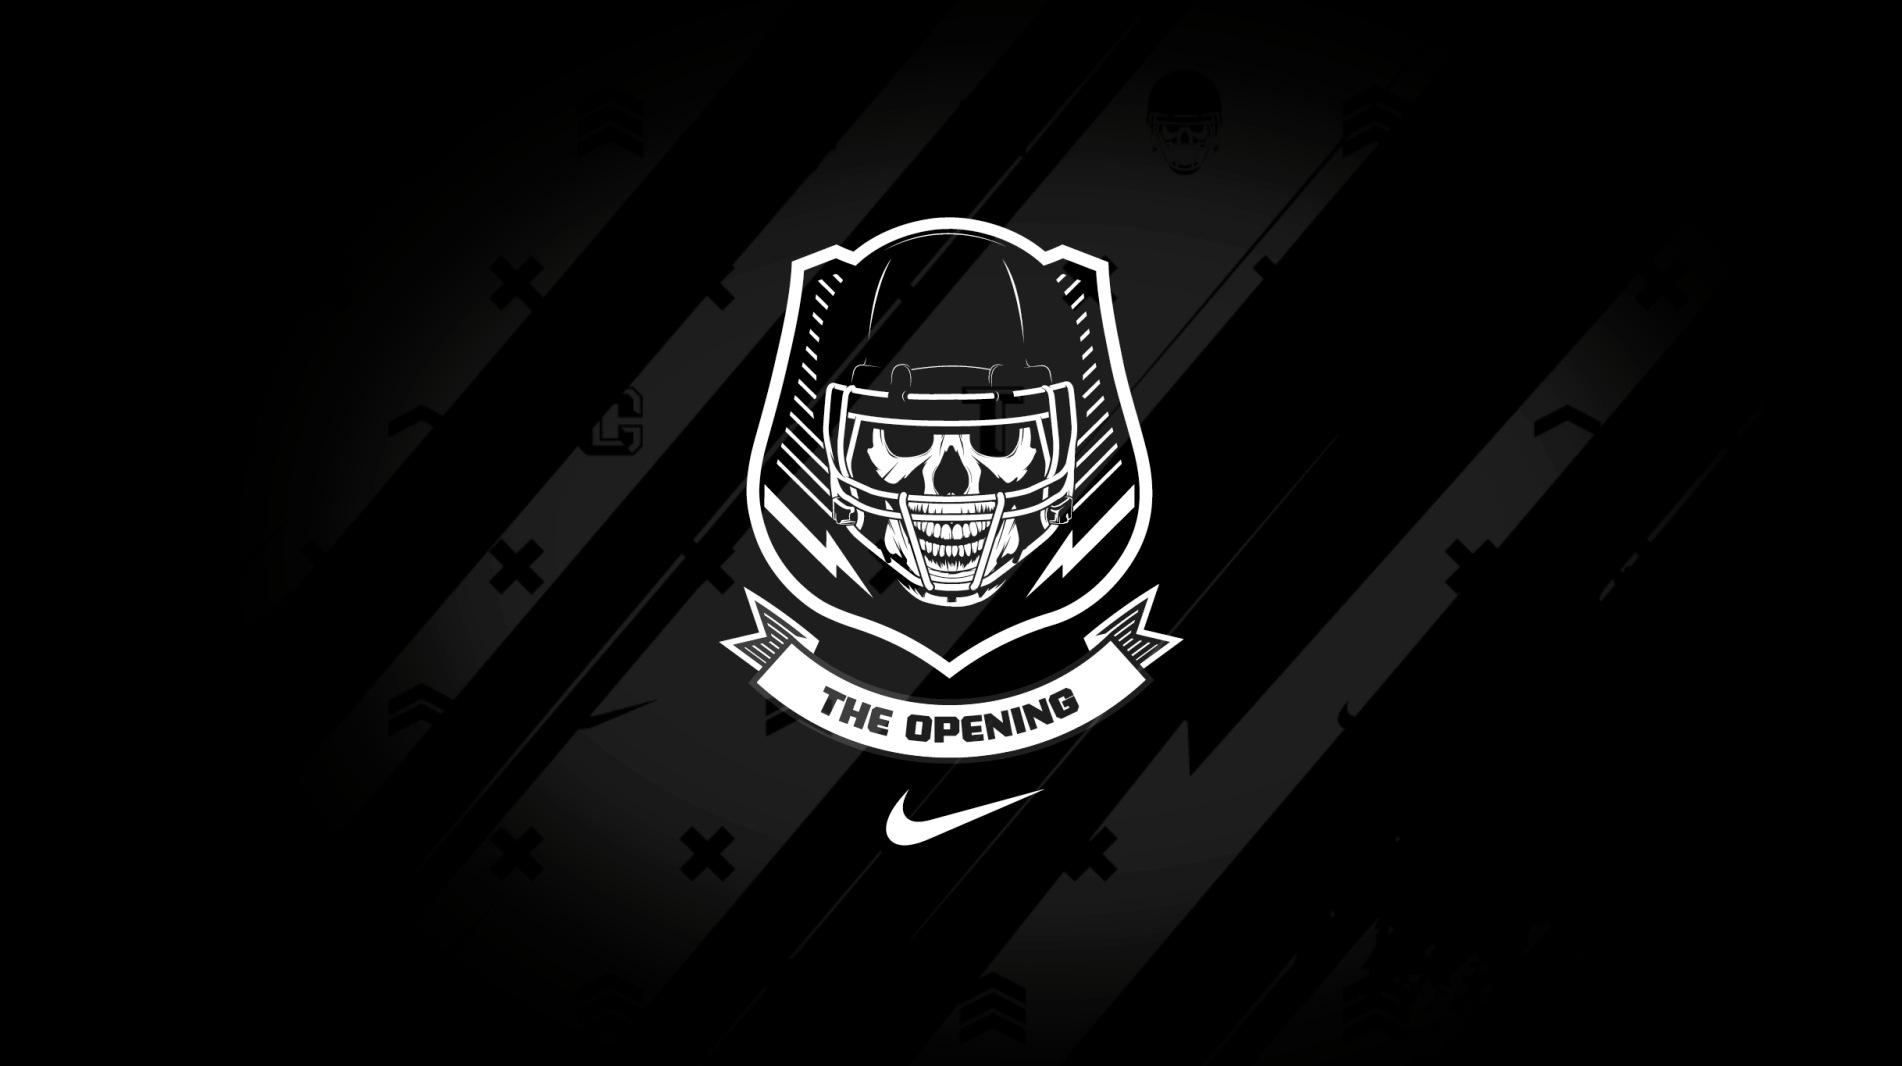 Nike College Football Wallpaper - WallpaperSafari - photo#45